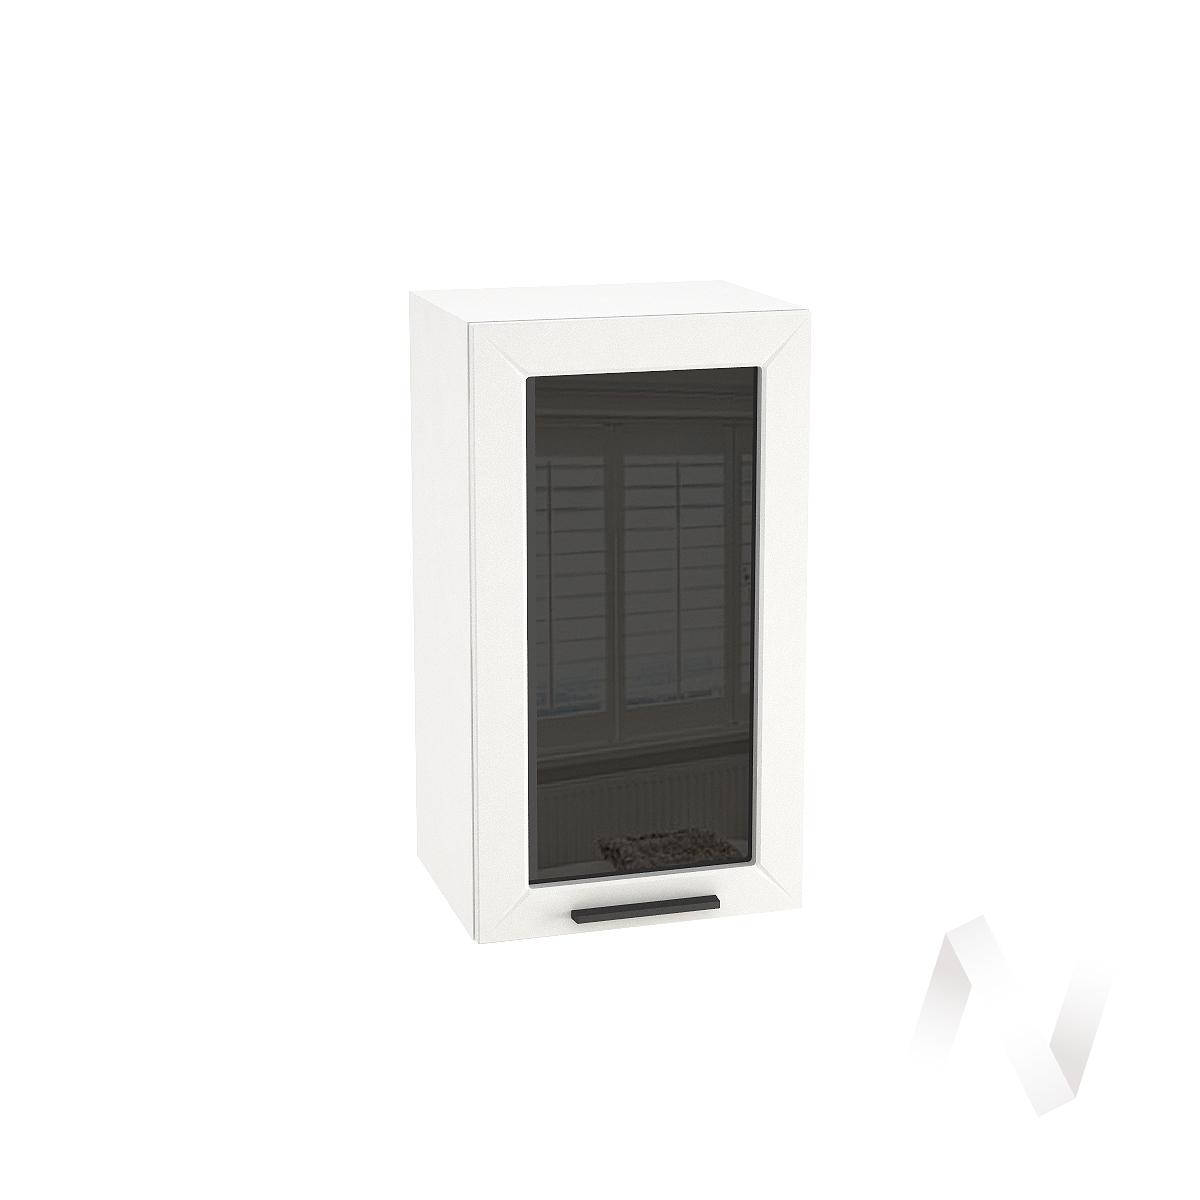 "Кухня ""Глетчер"": Шкаф верхний со стеклом 400, ШВС 400 (Айленд силк/корпус белый)"